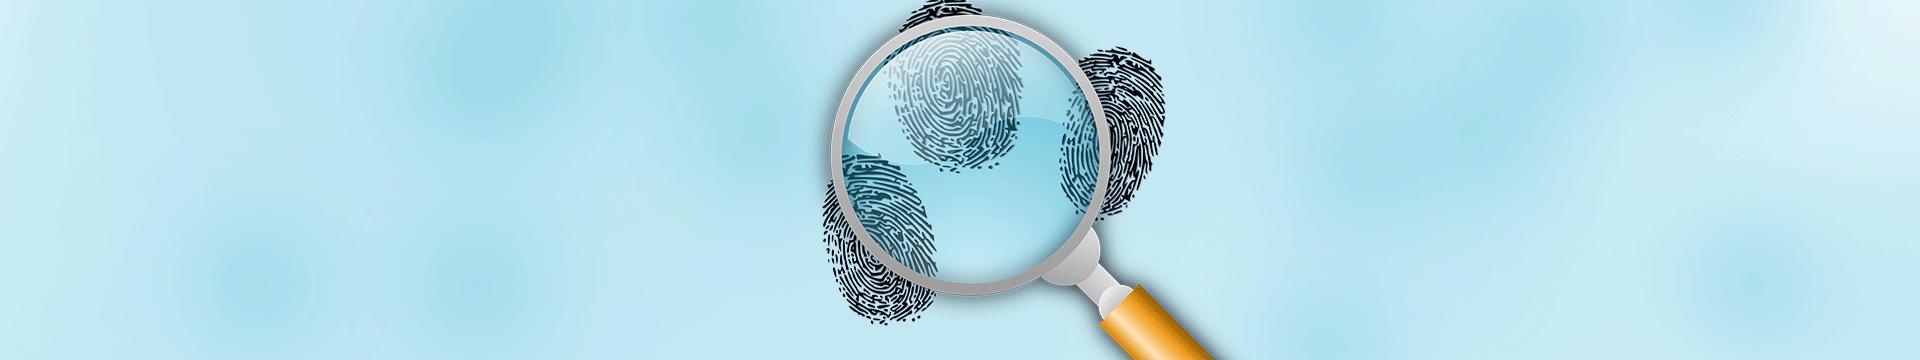 Missing Person Cases - City of Spokane, Washington